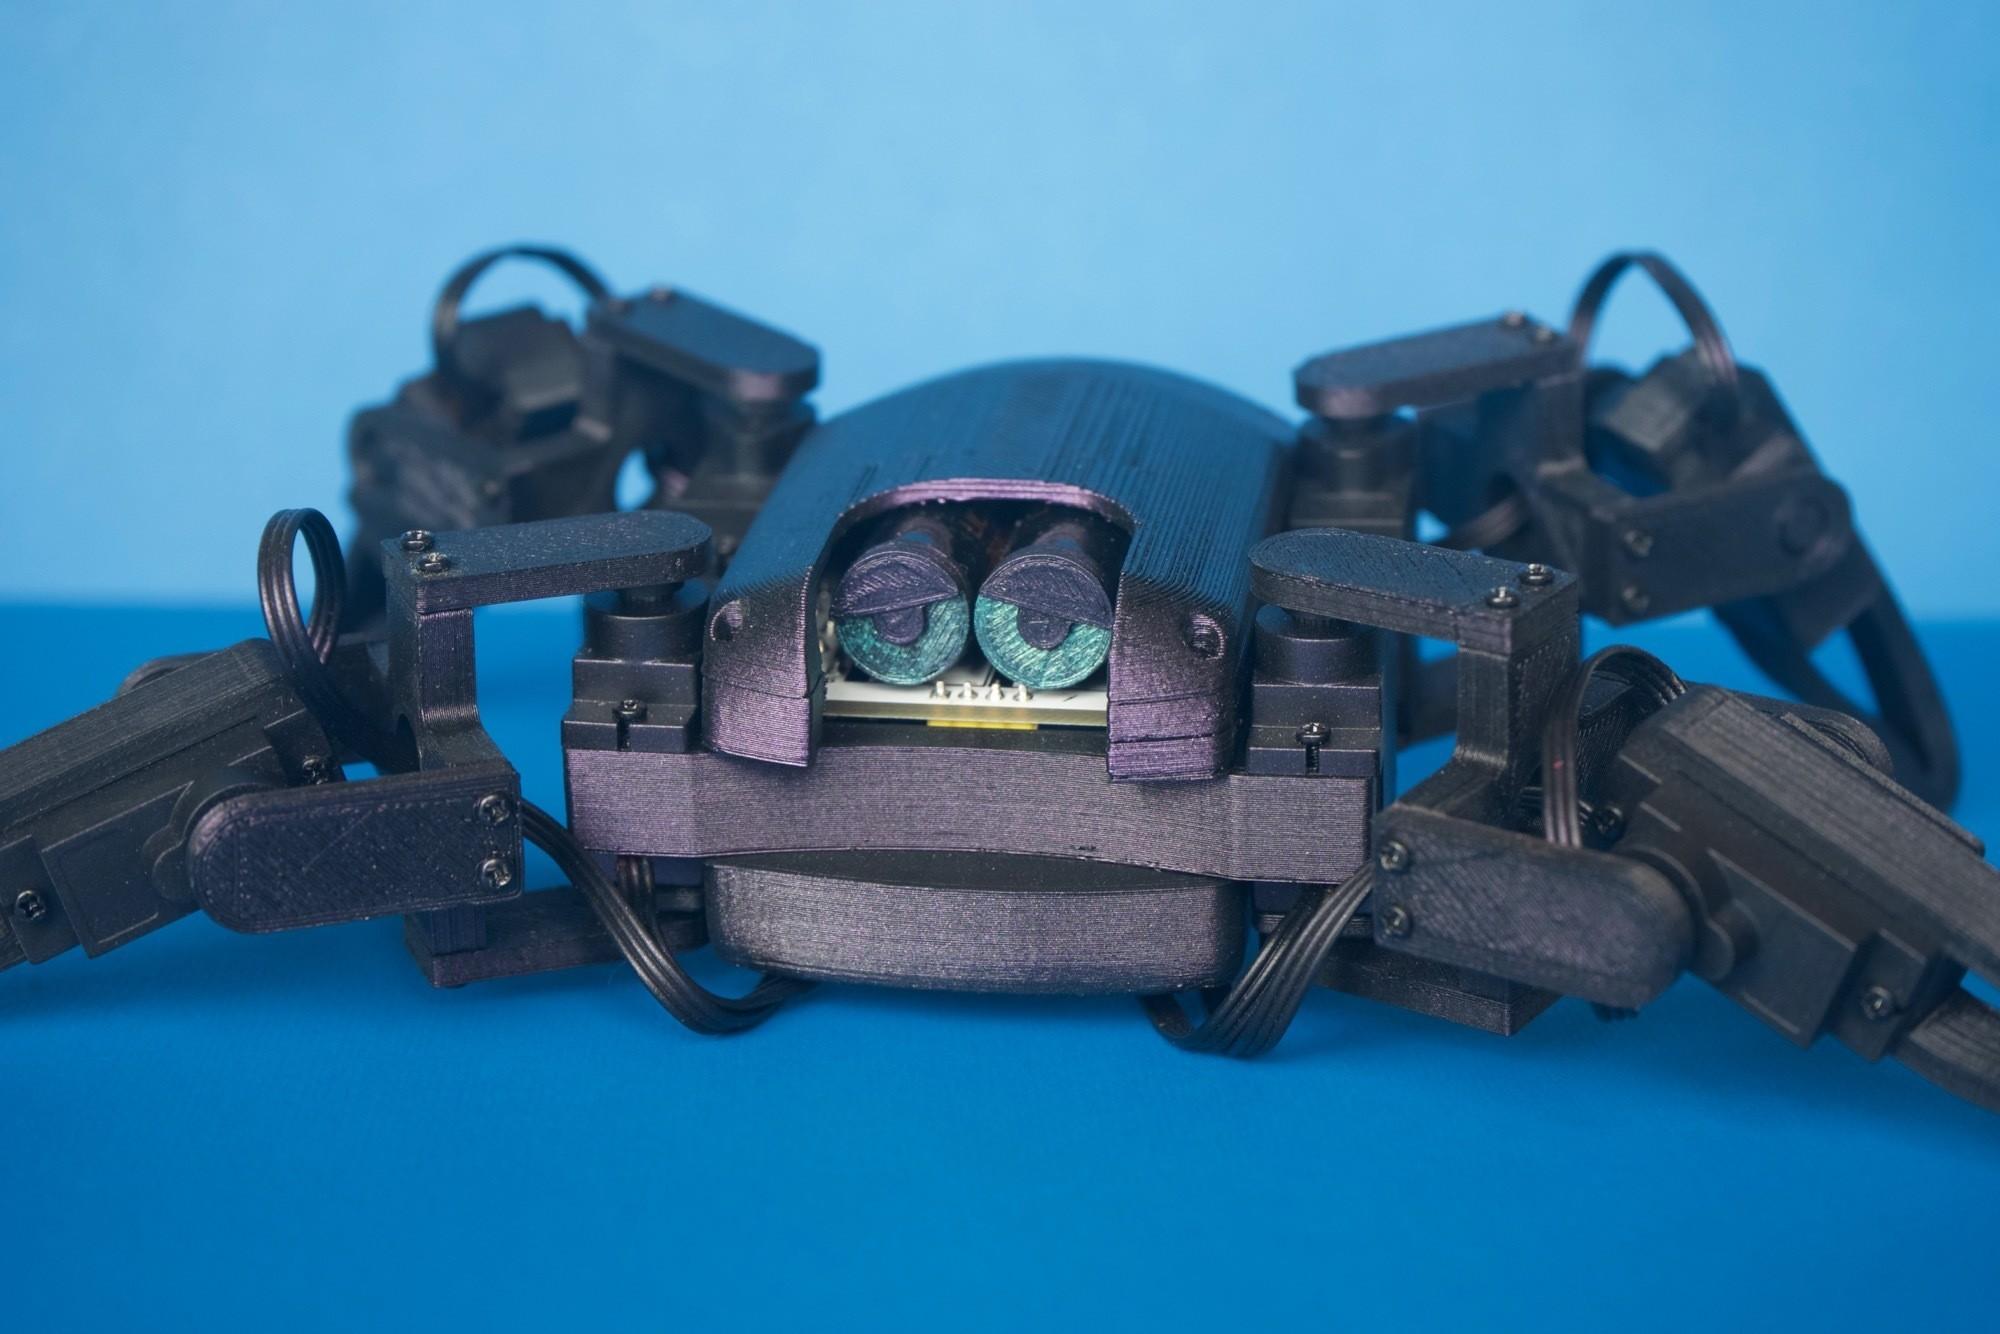 Q1mini004.jpg Download free STL file Q1 mini Quadruped Robot 2.0 (Designed by Jason Workshop) • 3D printing design, Jason8866